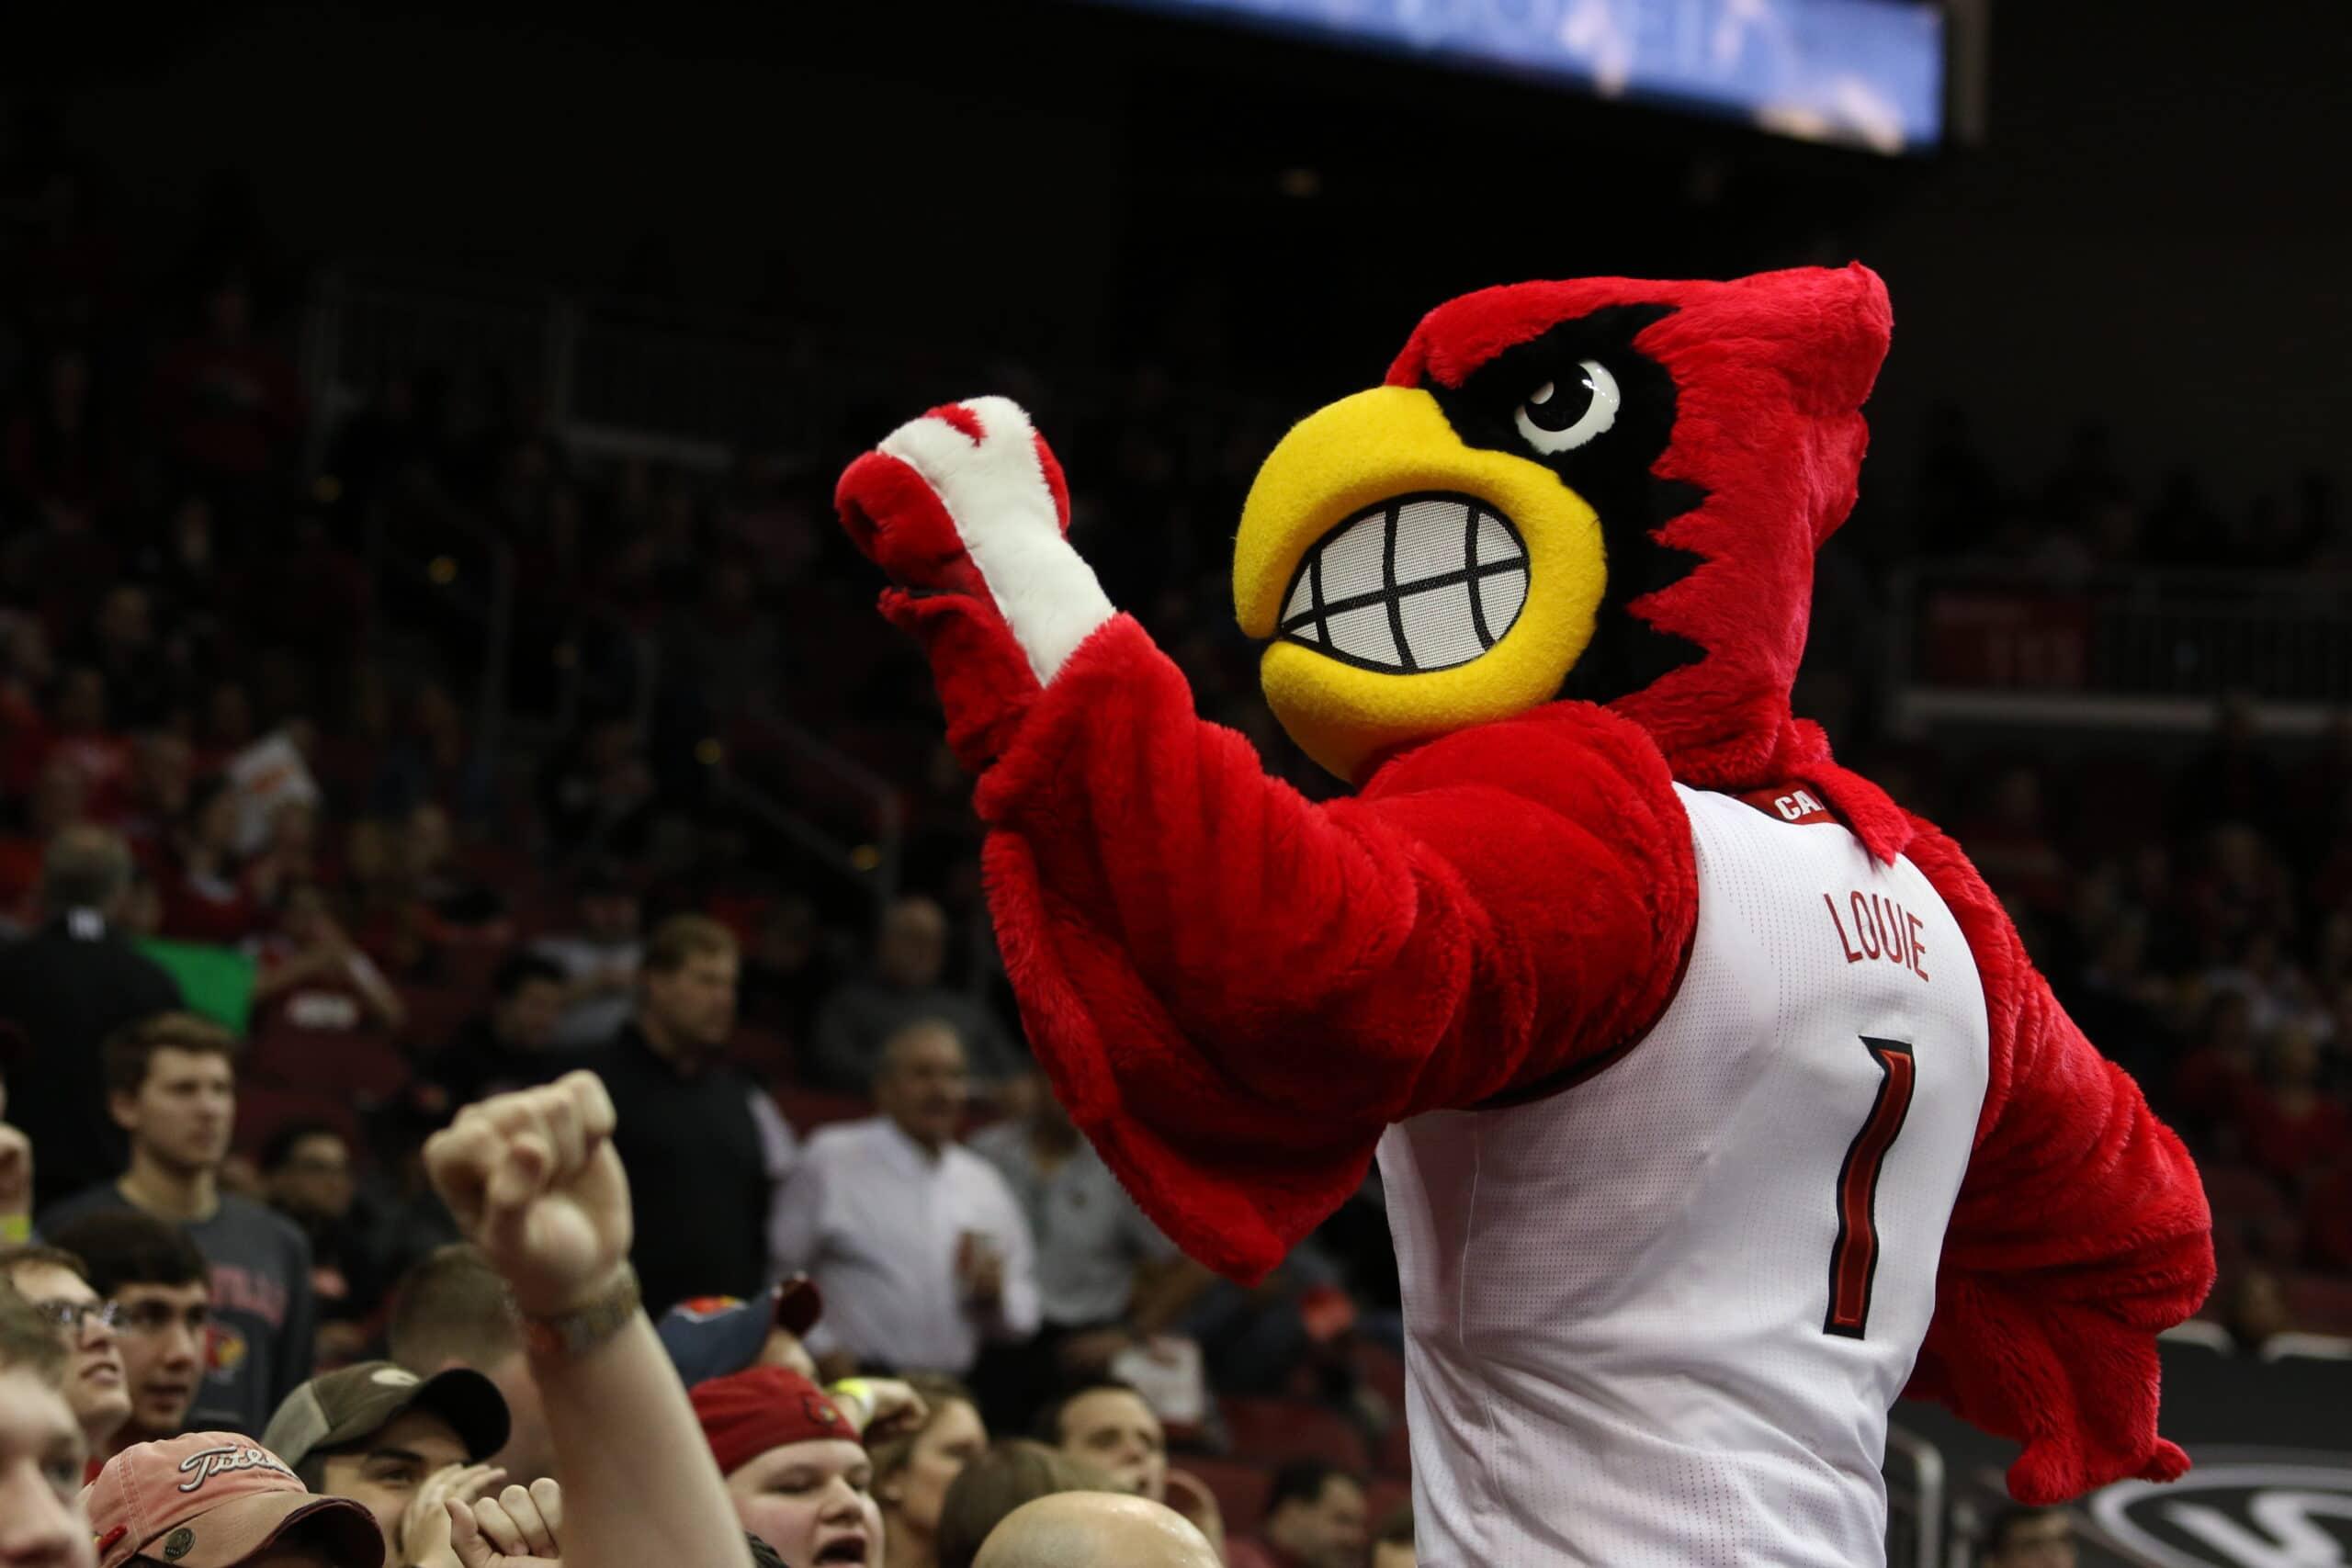 Louie the Cardinal